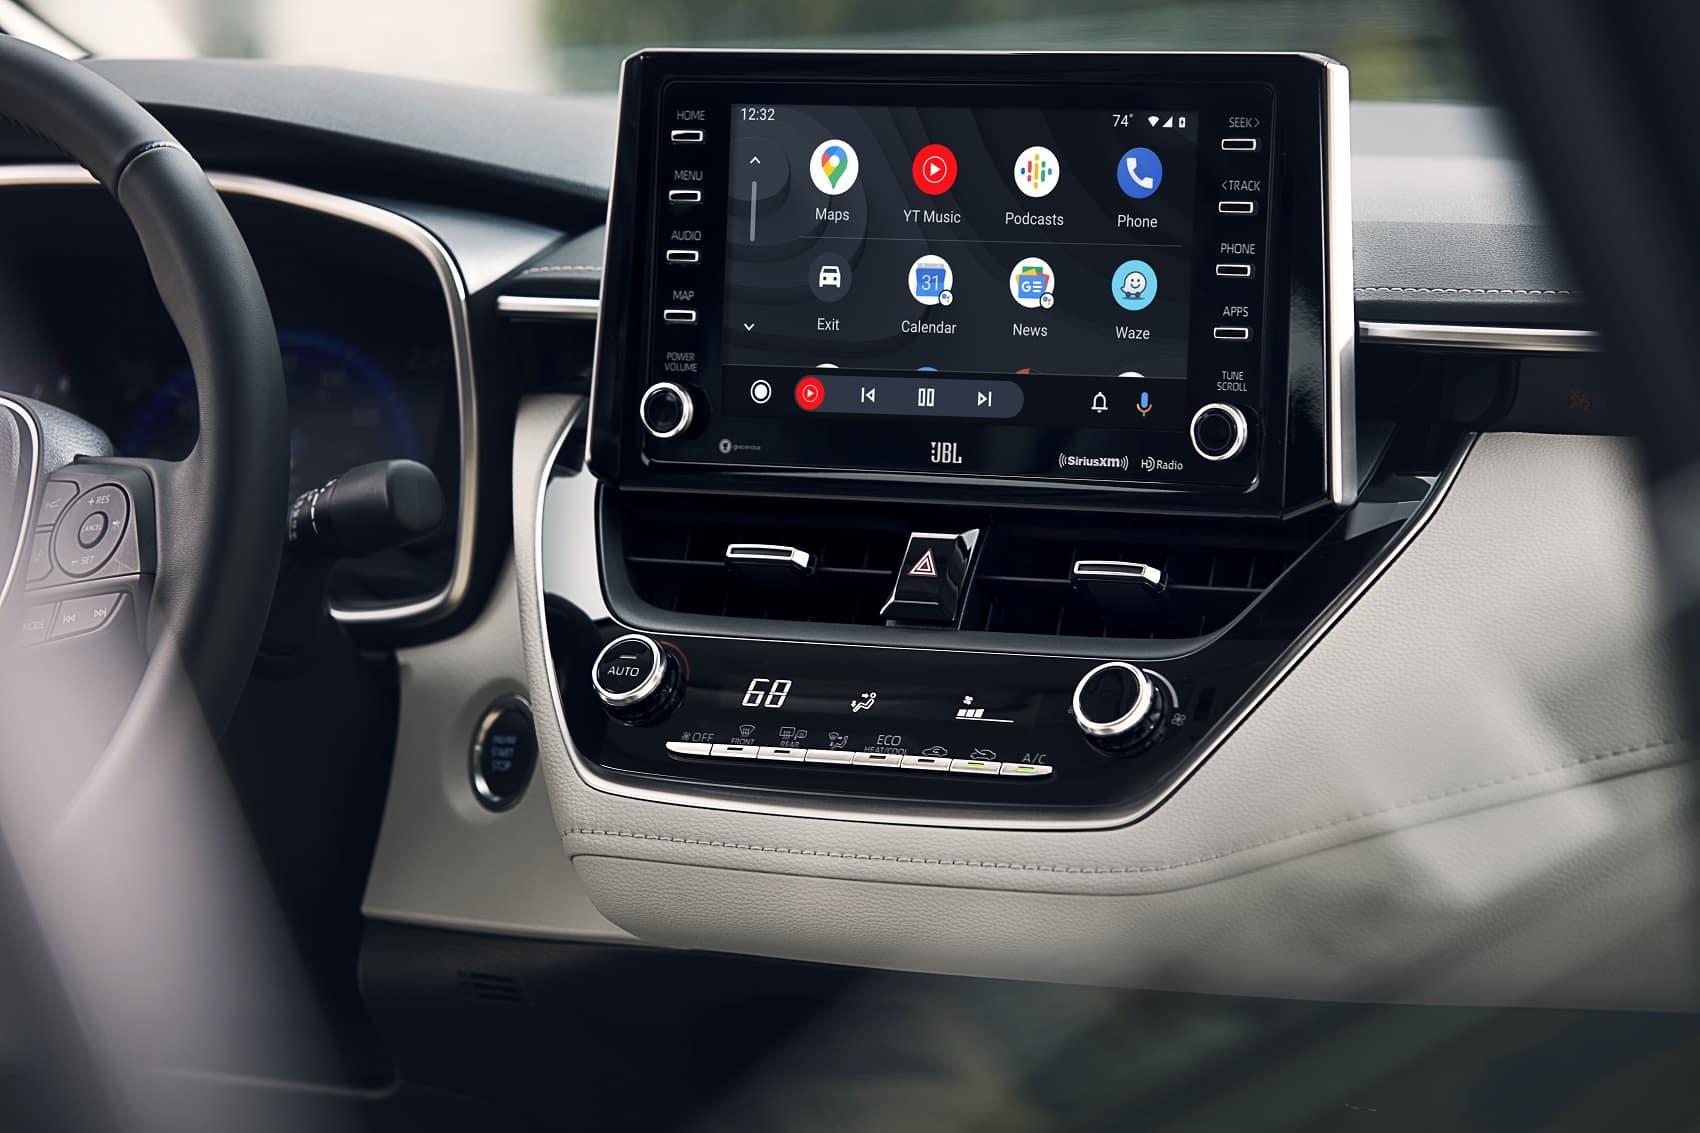 2021 Toyota Corolla Interior with Android Auto™